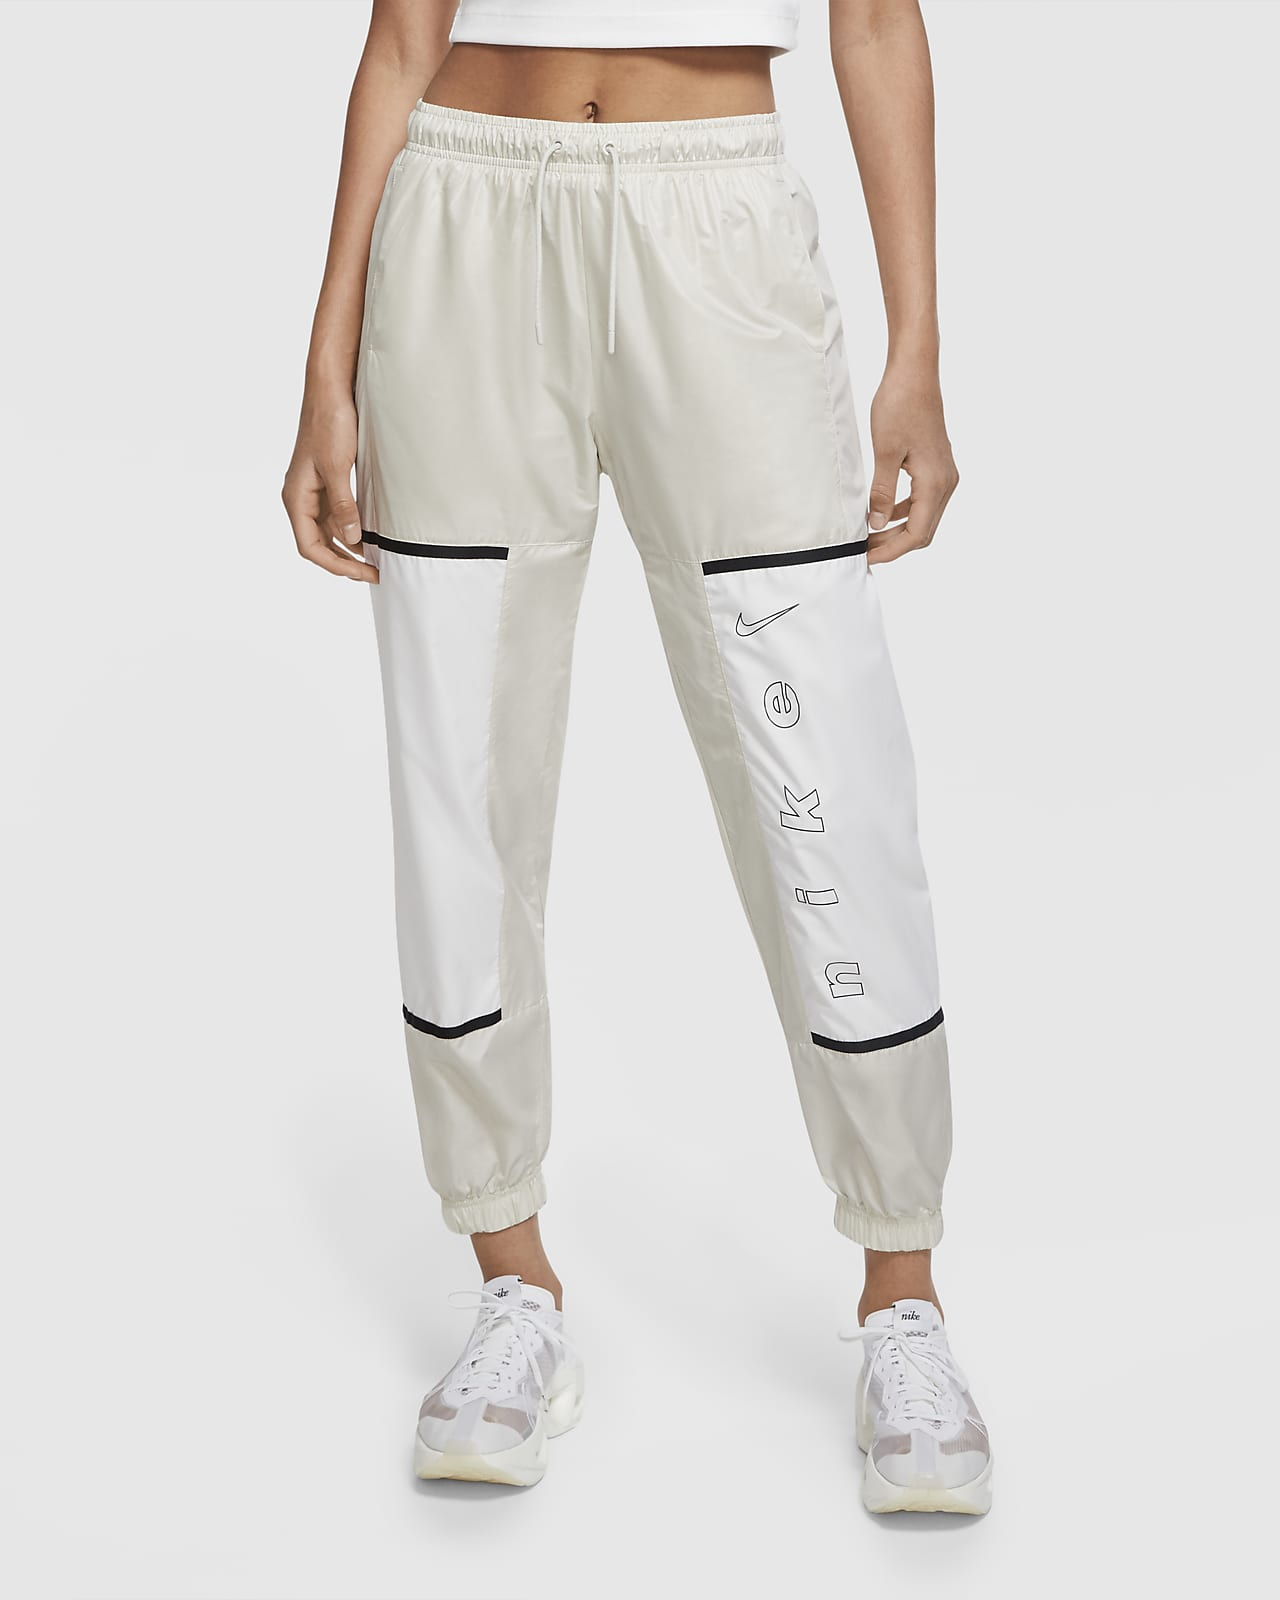 Pantaloni woven Nike Sportswear - Donna